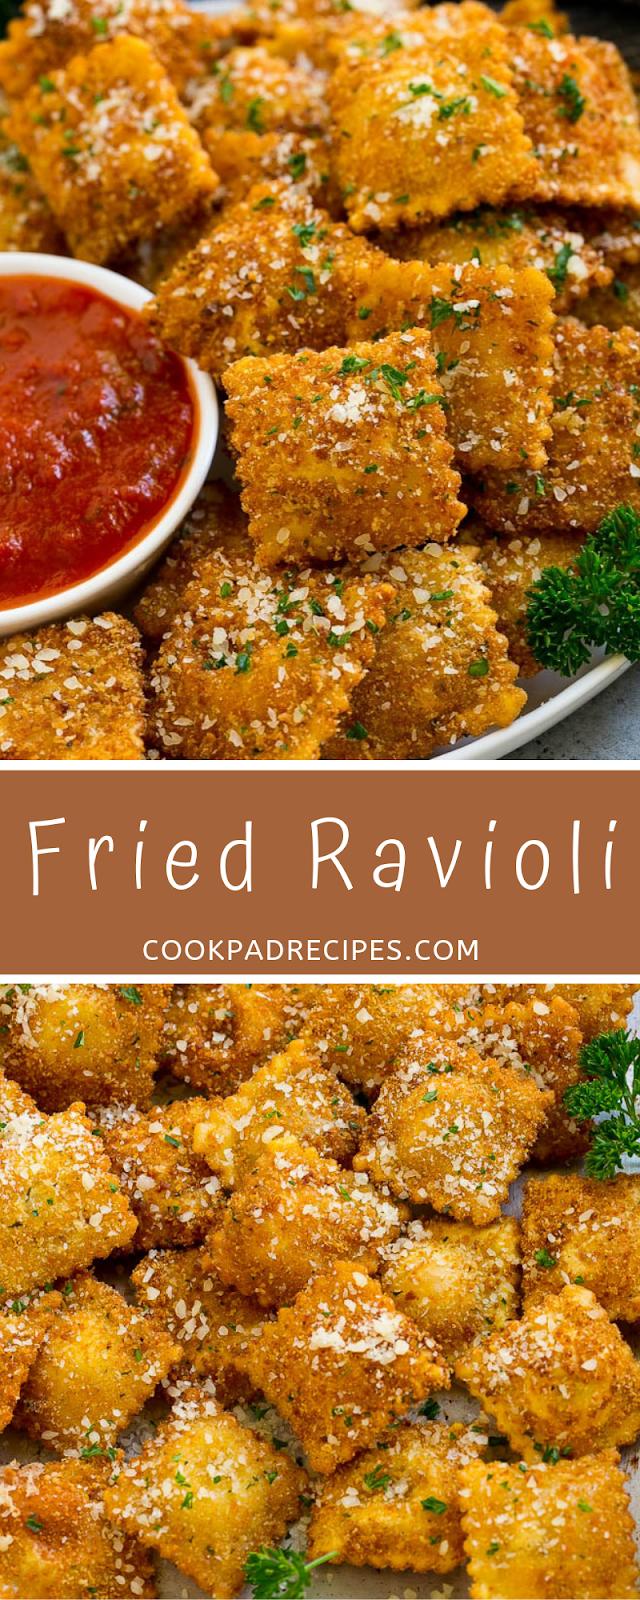 Fried Ravioli